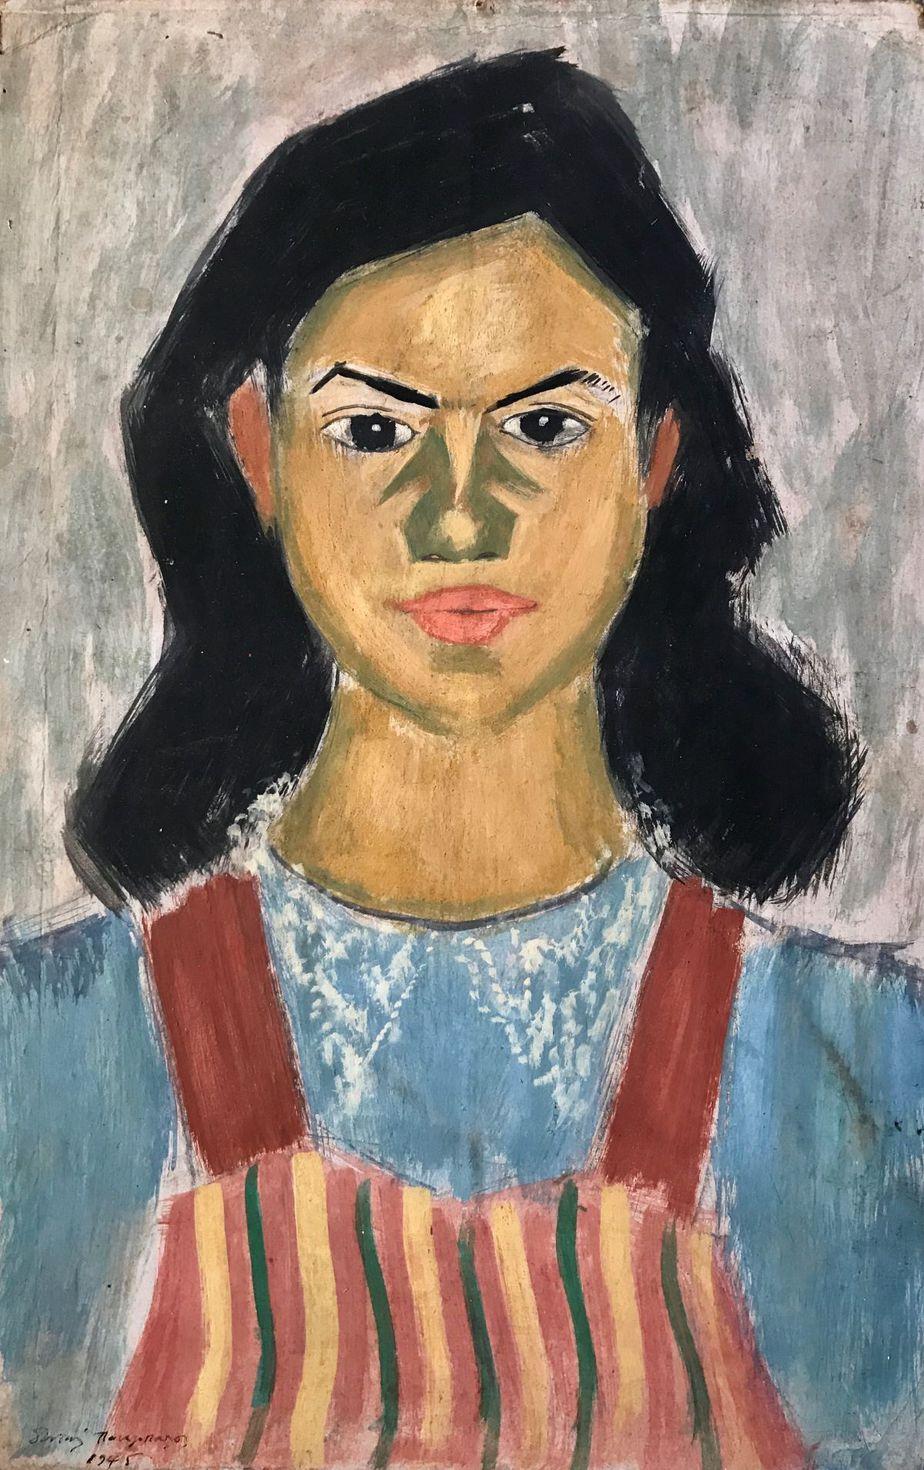 Danil (Panagopoulos) (1924-2008) Oil on paper, 1945 48 x 31 cm